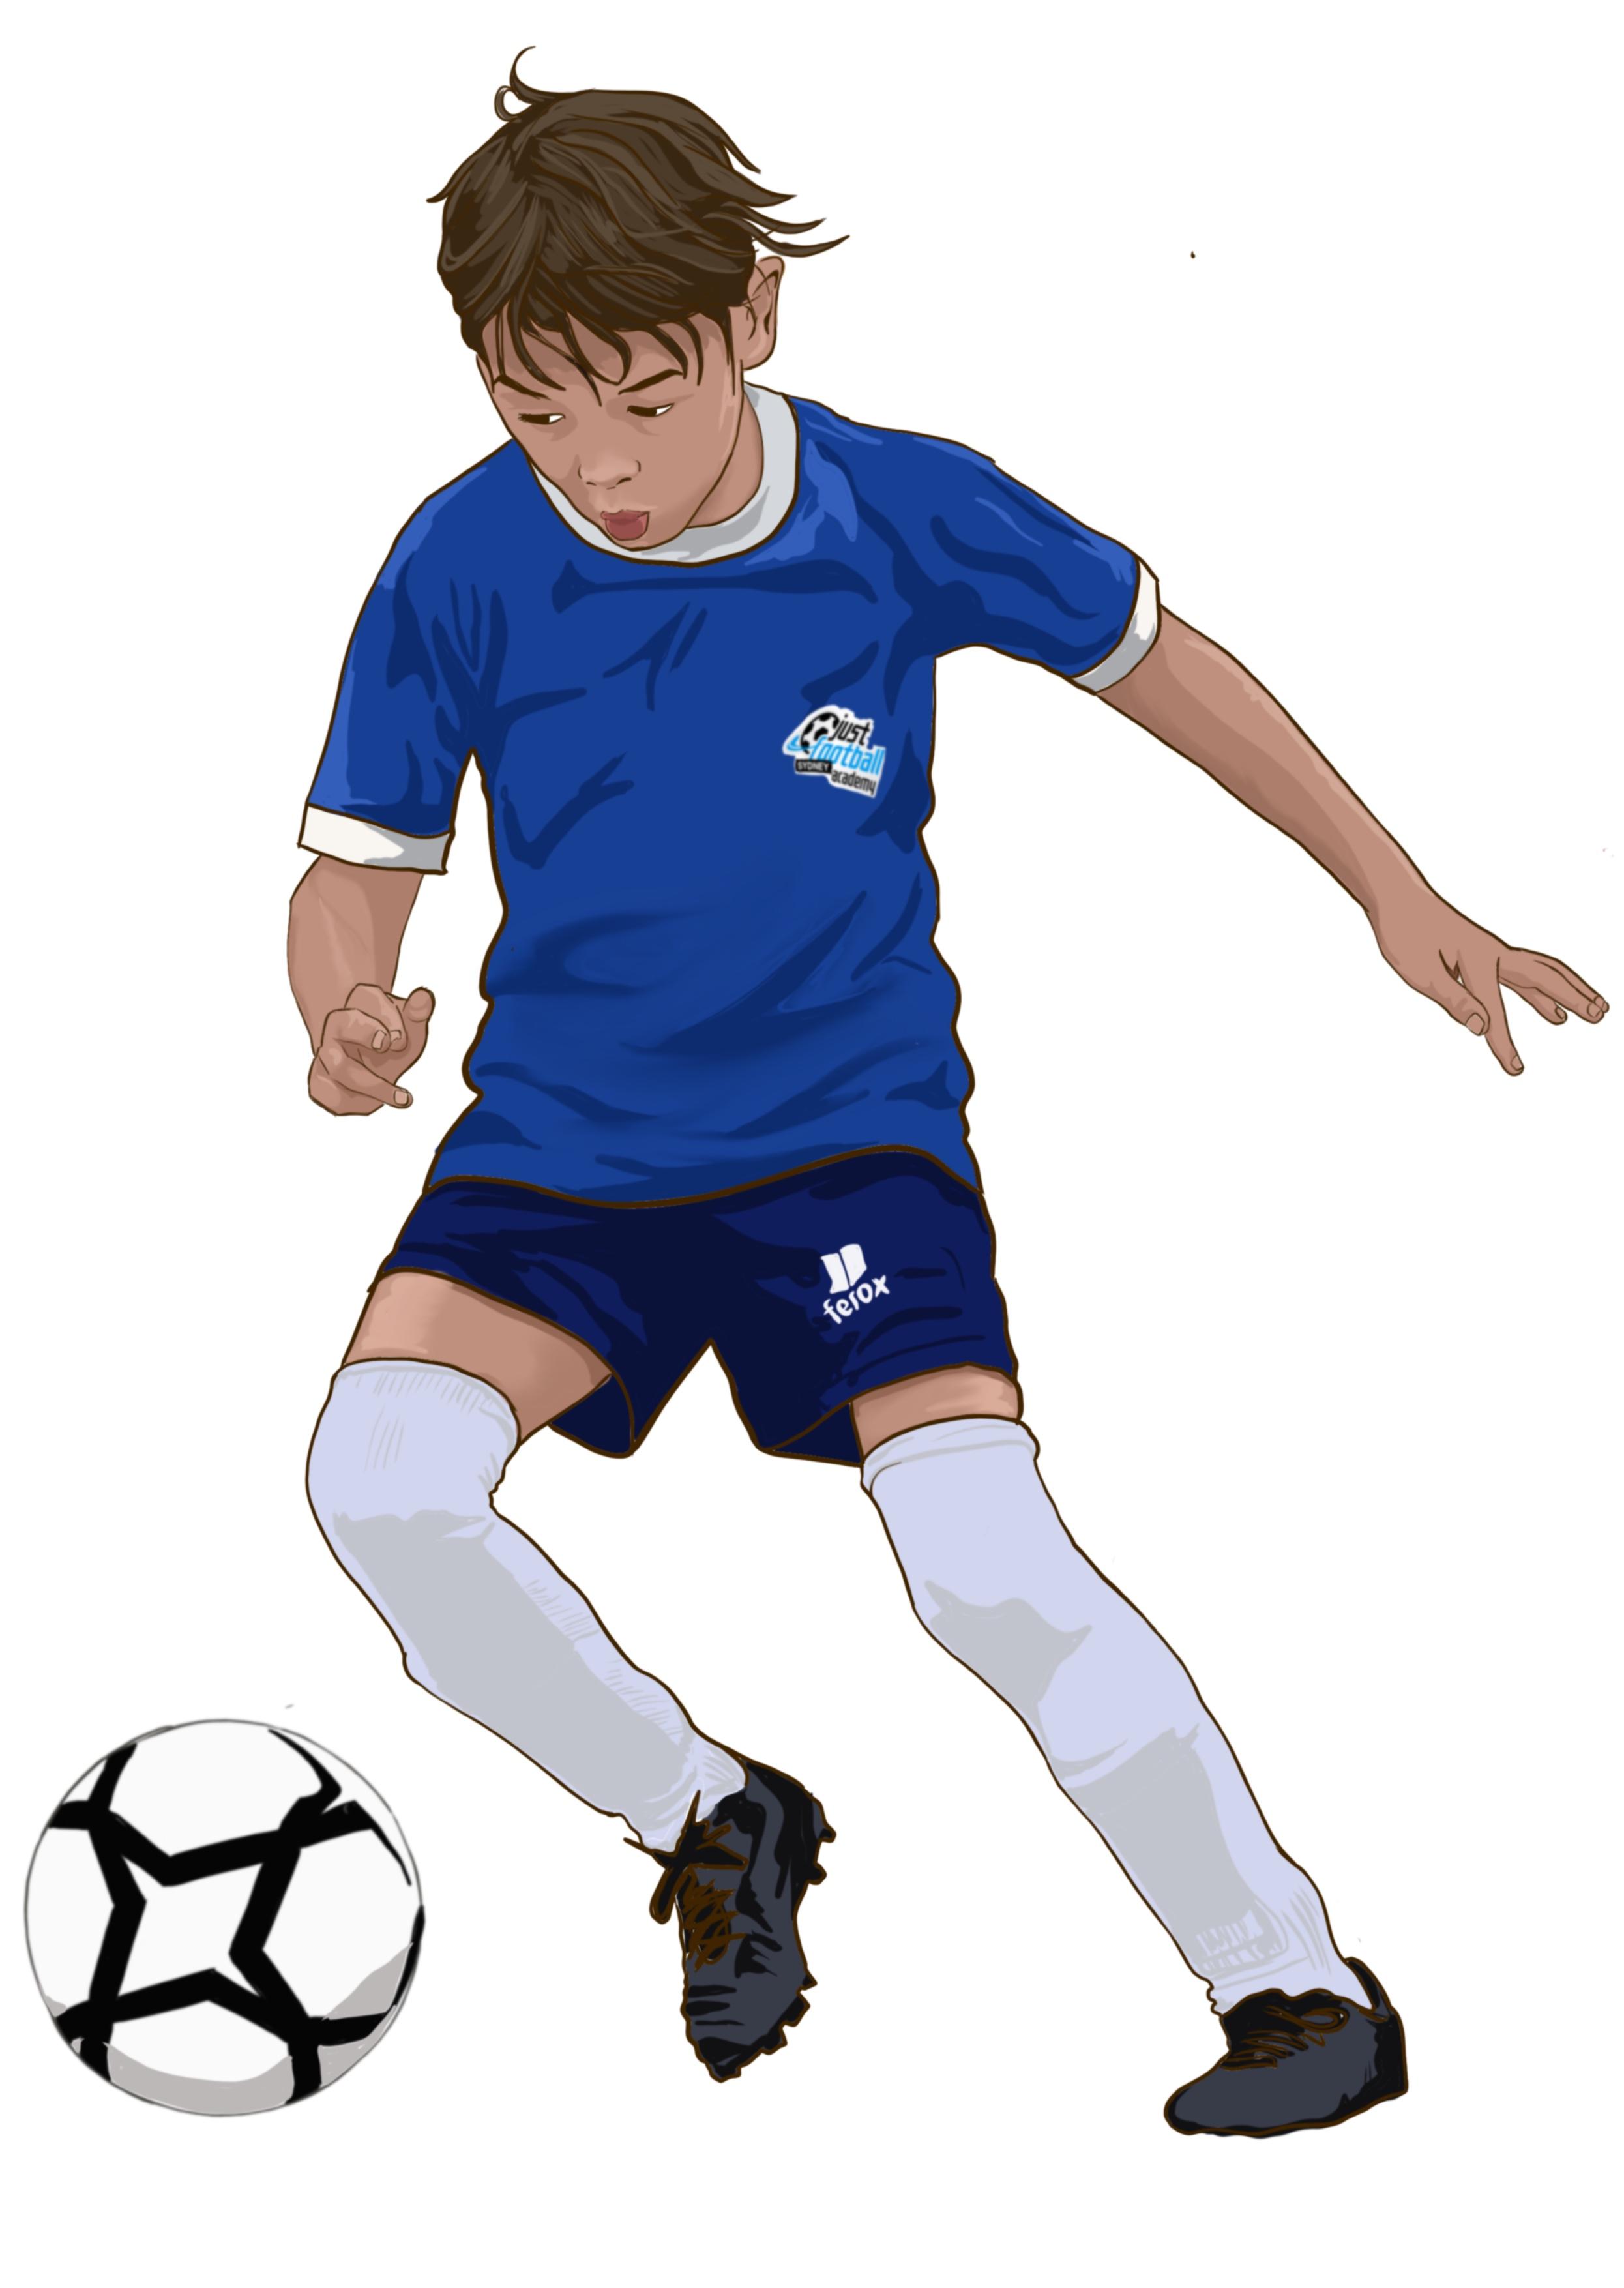 https://justfootballacademy.com.au/wp-content/uploads/2018/08/Photo-17-8-18-11-06-29-am-1.jpg